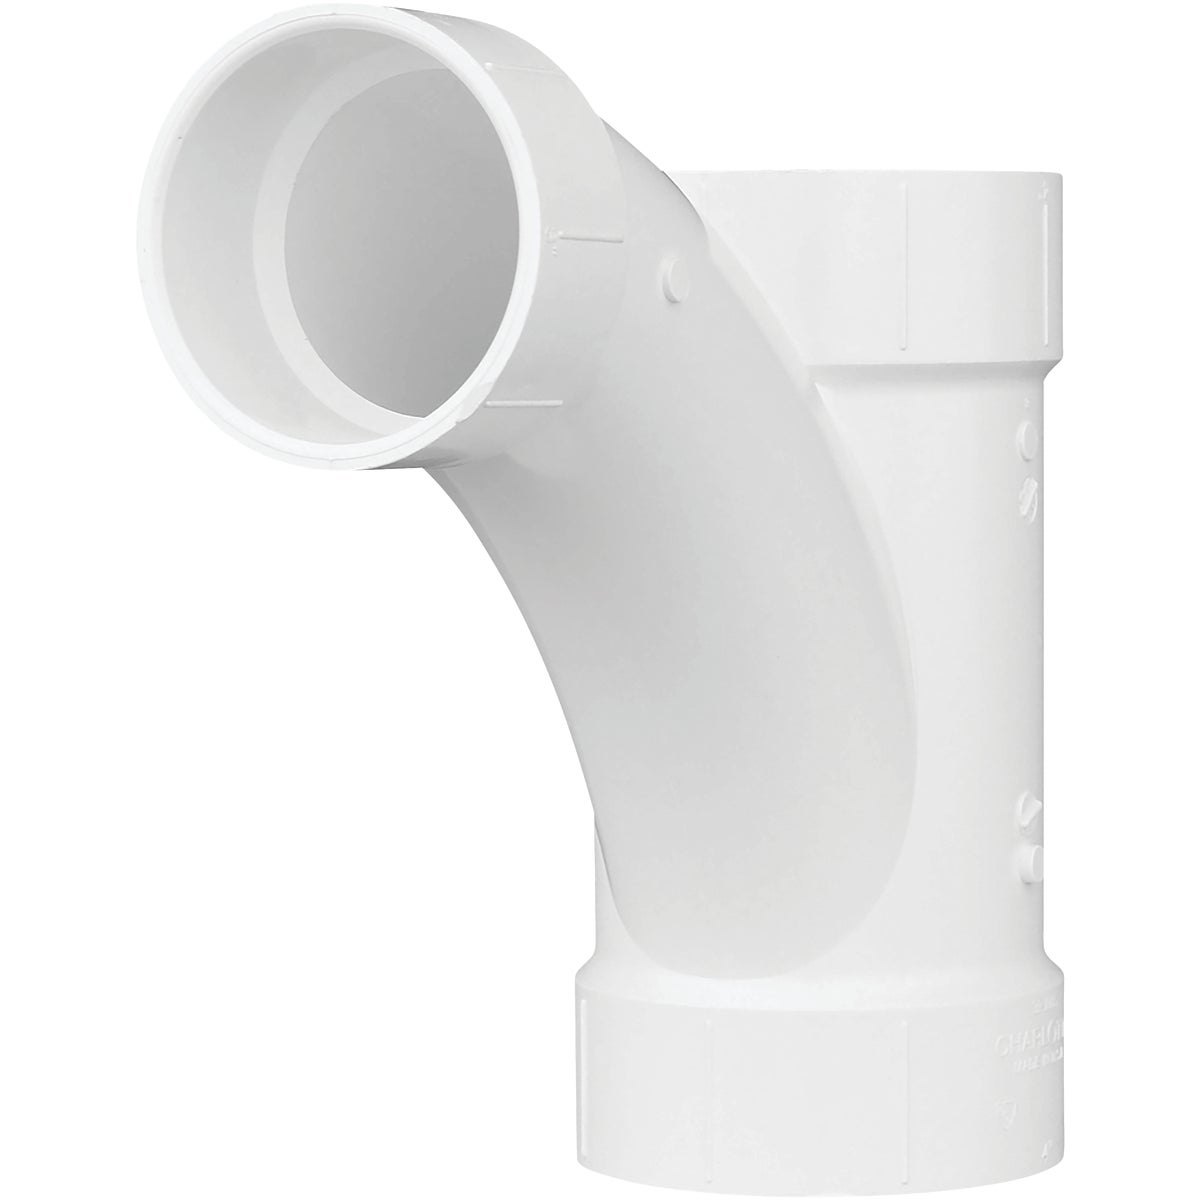 4X4X3 COMBO PVC TEE-WYE - 72543 by Genova Inc  Pvc Dwv